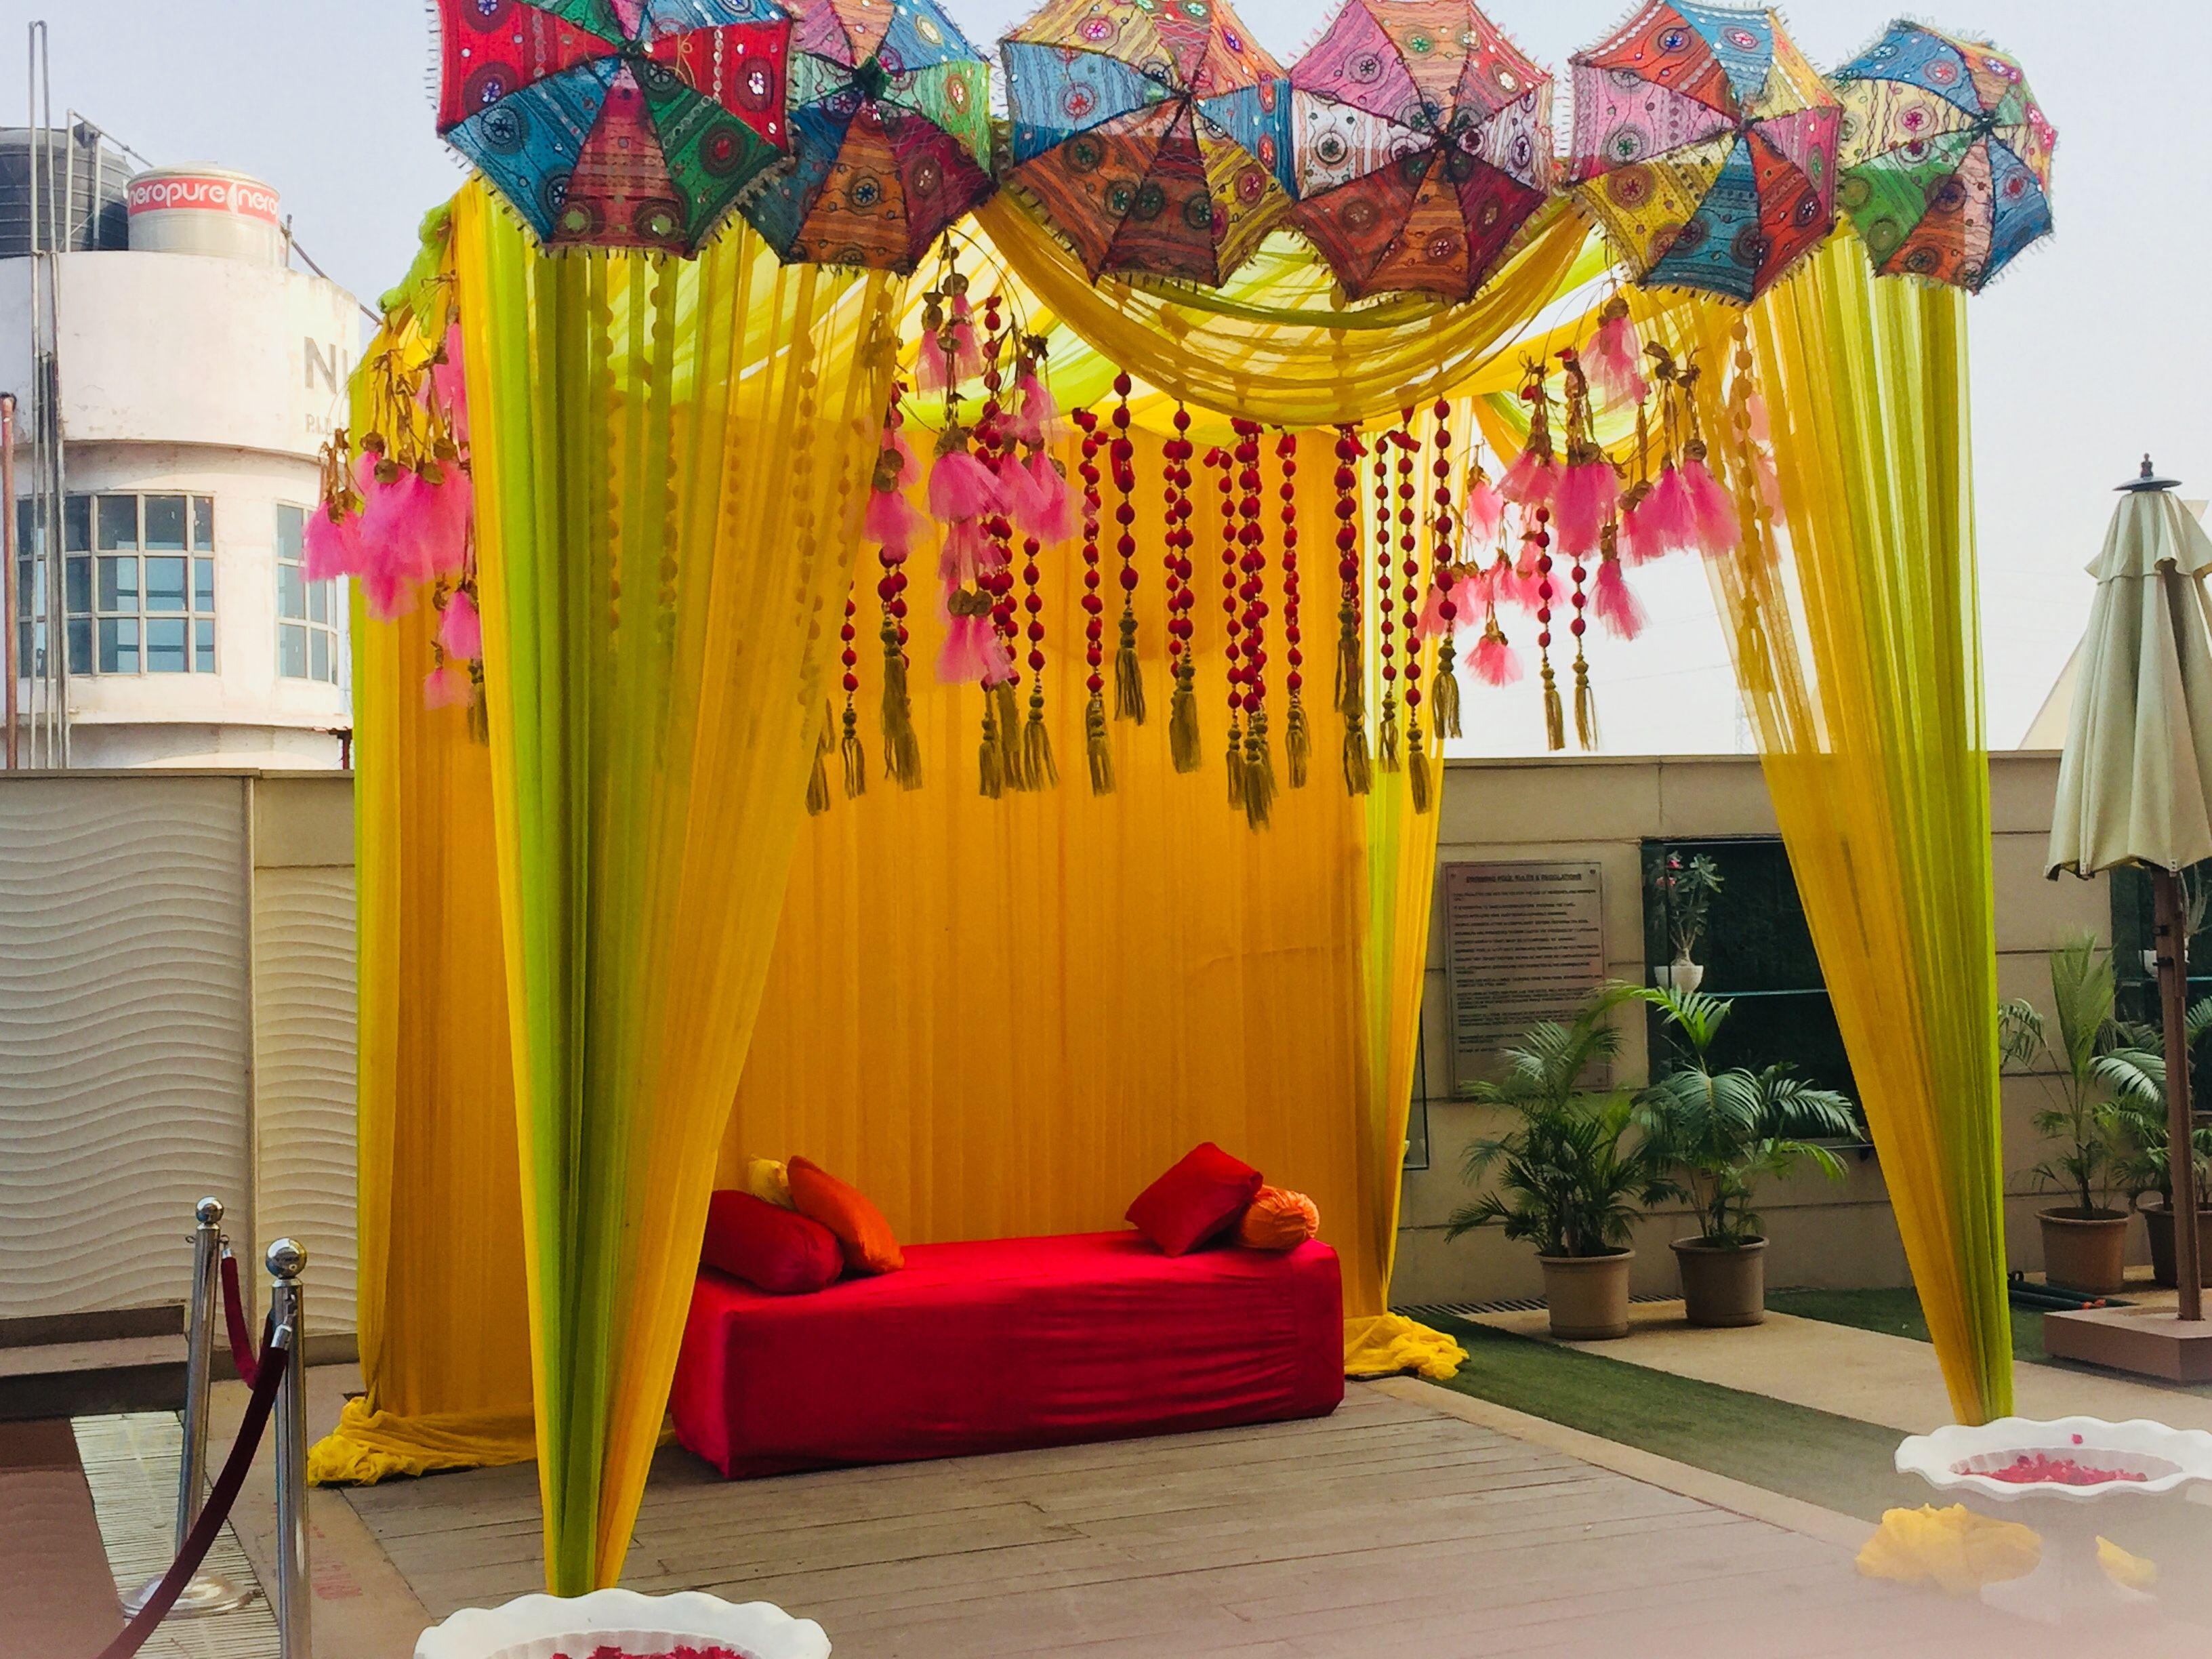 Haldi Decor Hindu Wedding Decorations Home Wedding Decorations